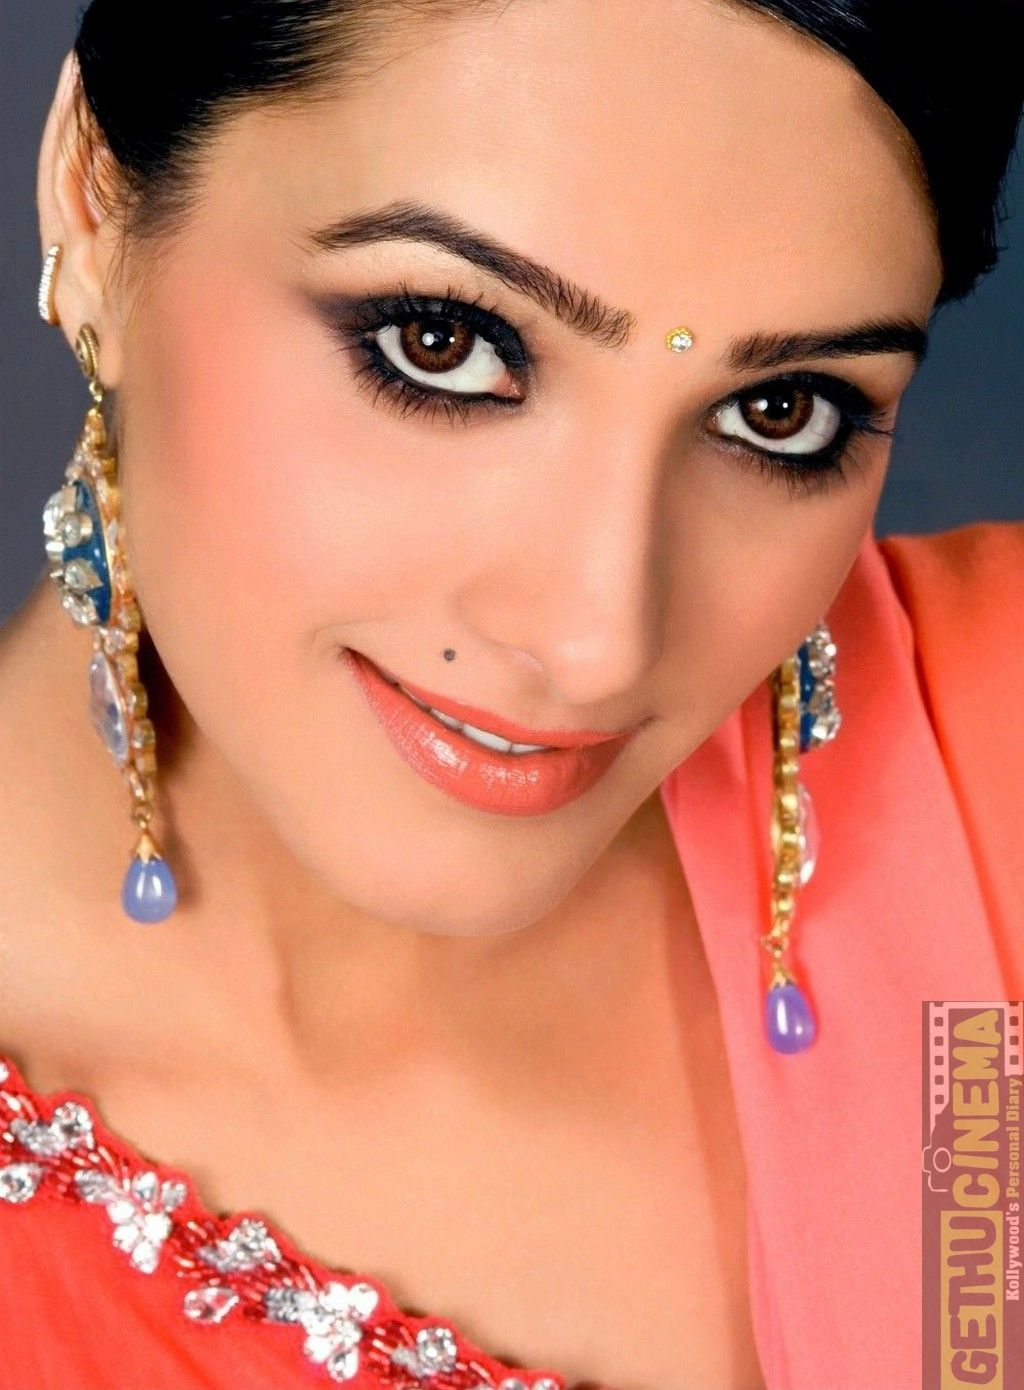 Actress Anita Hassanandani Cute Gallery Gethu Cinema In 2021 Hollywood Actress Pics Hollywood Actress Photos Celebrity Piercings